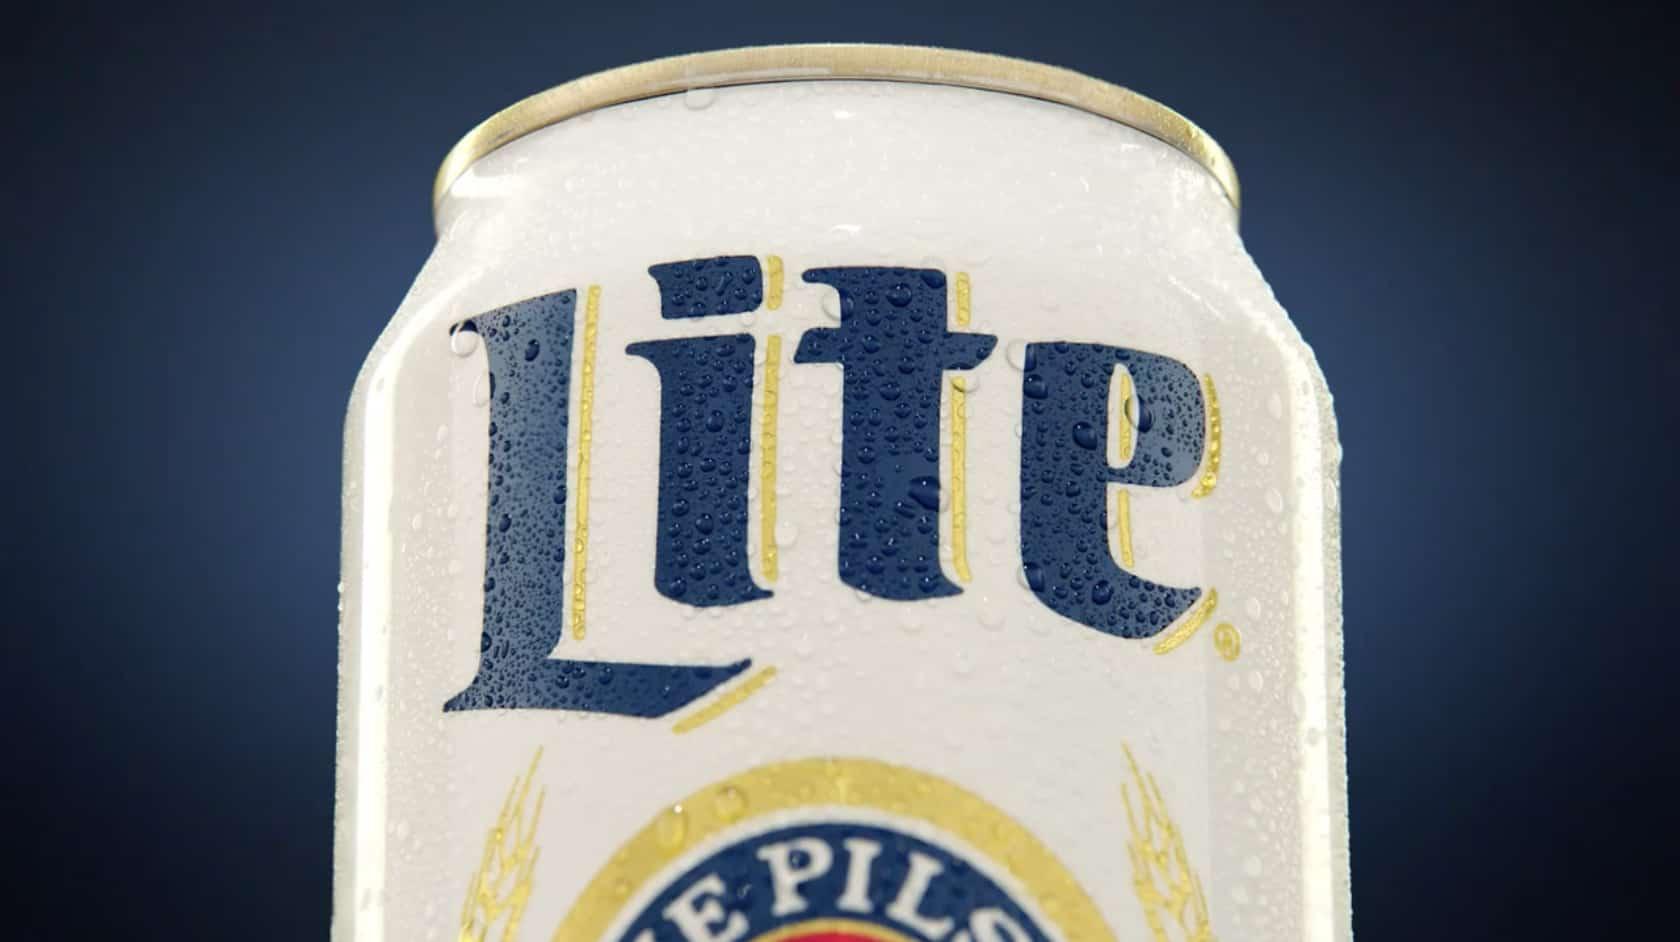 Miller Lite – light beer